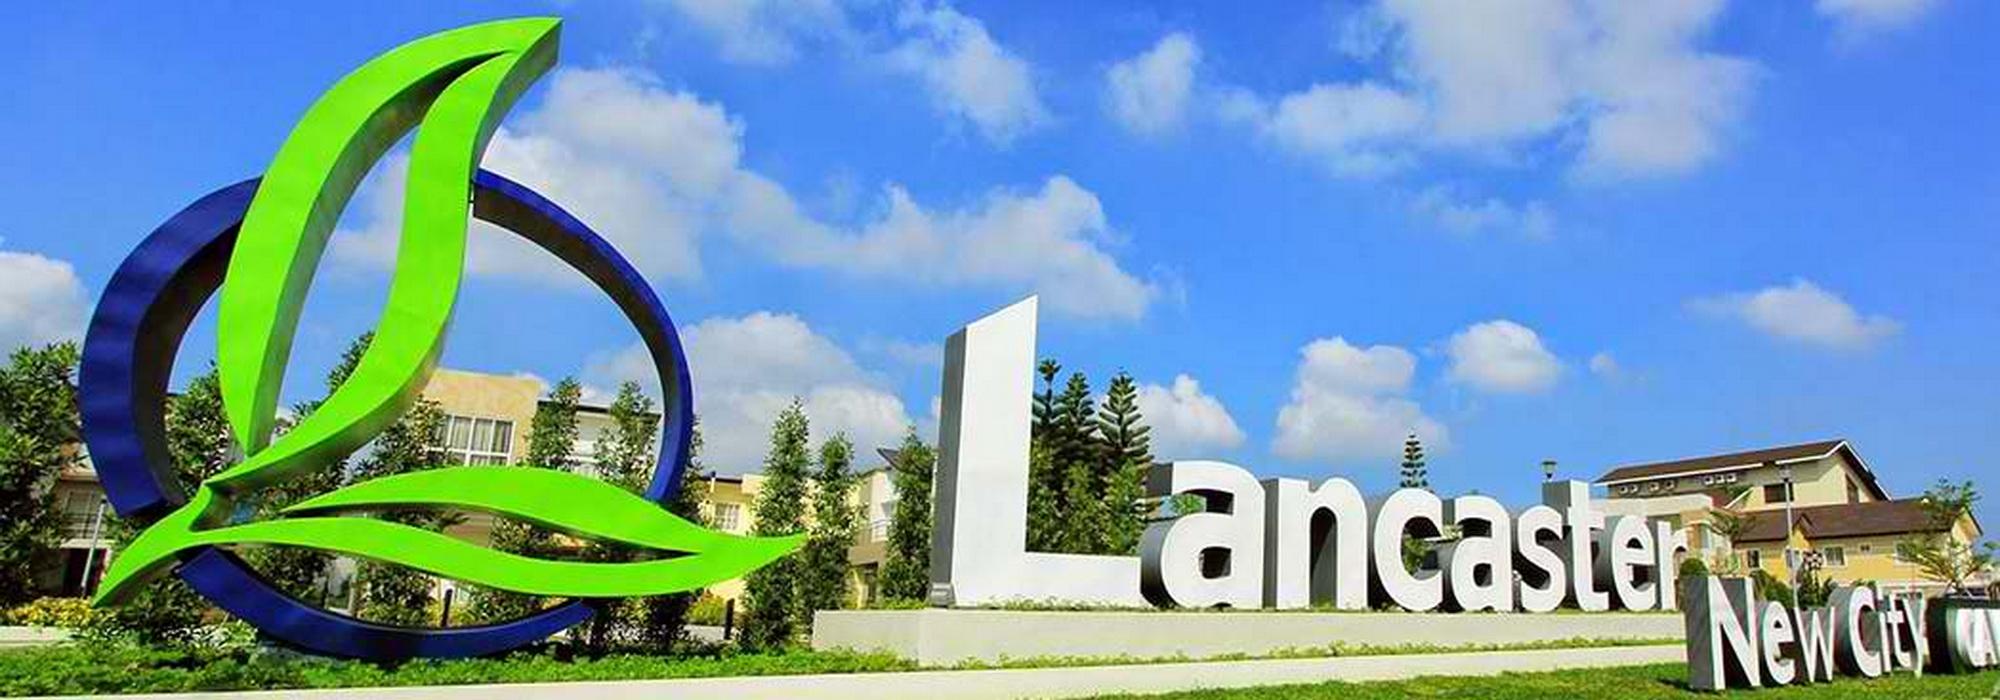 Lancaster New City